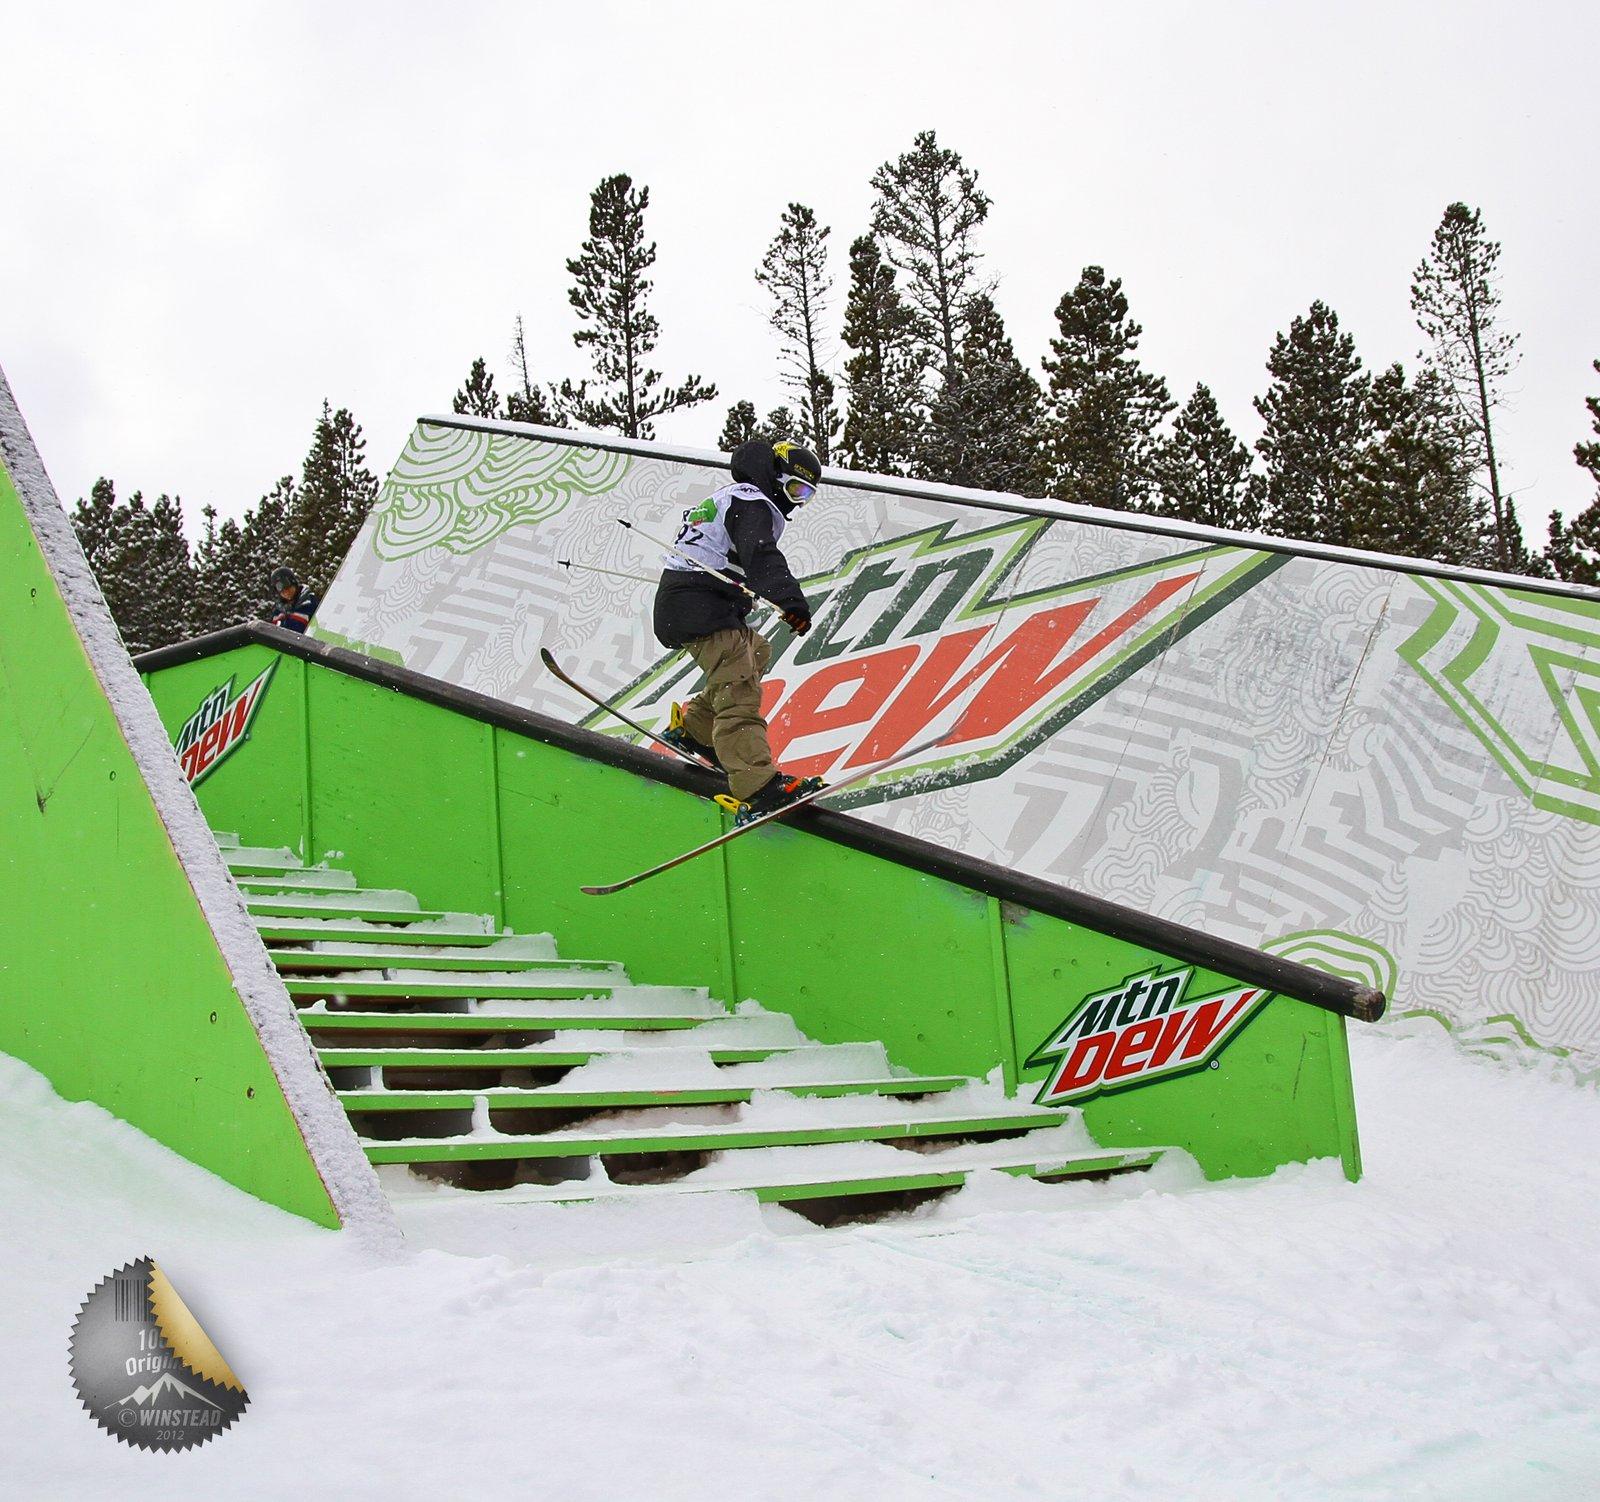 Winter Dew Tour 2012